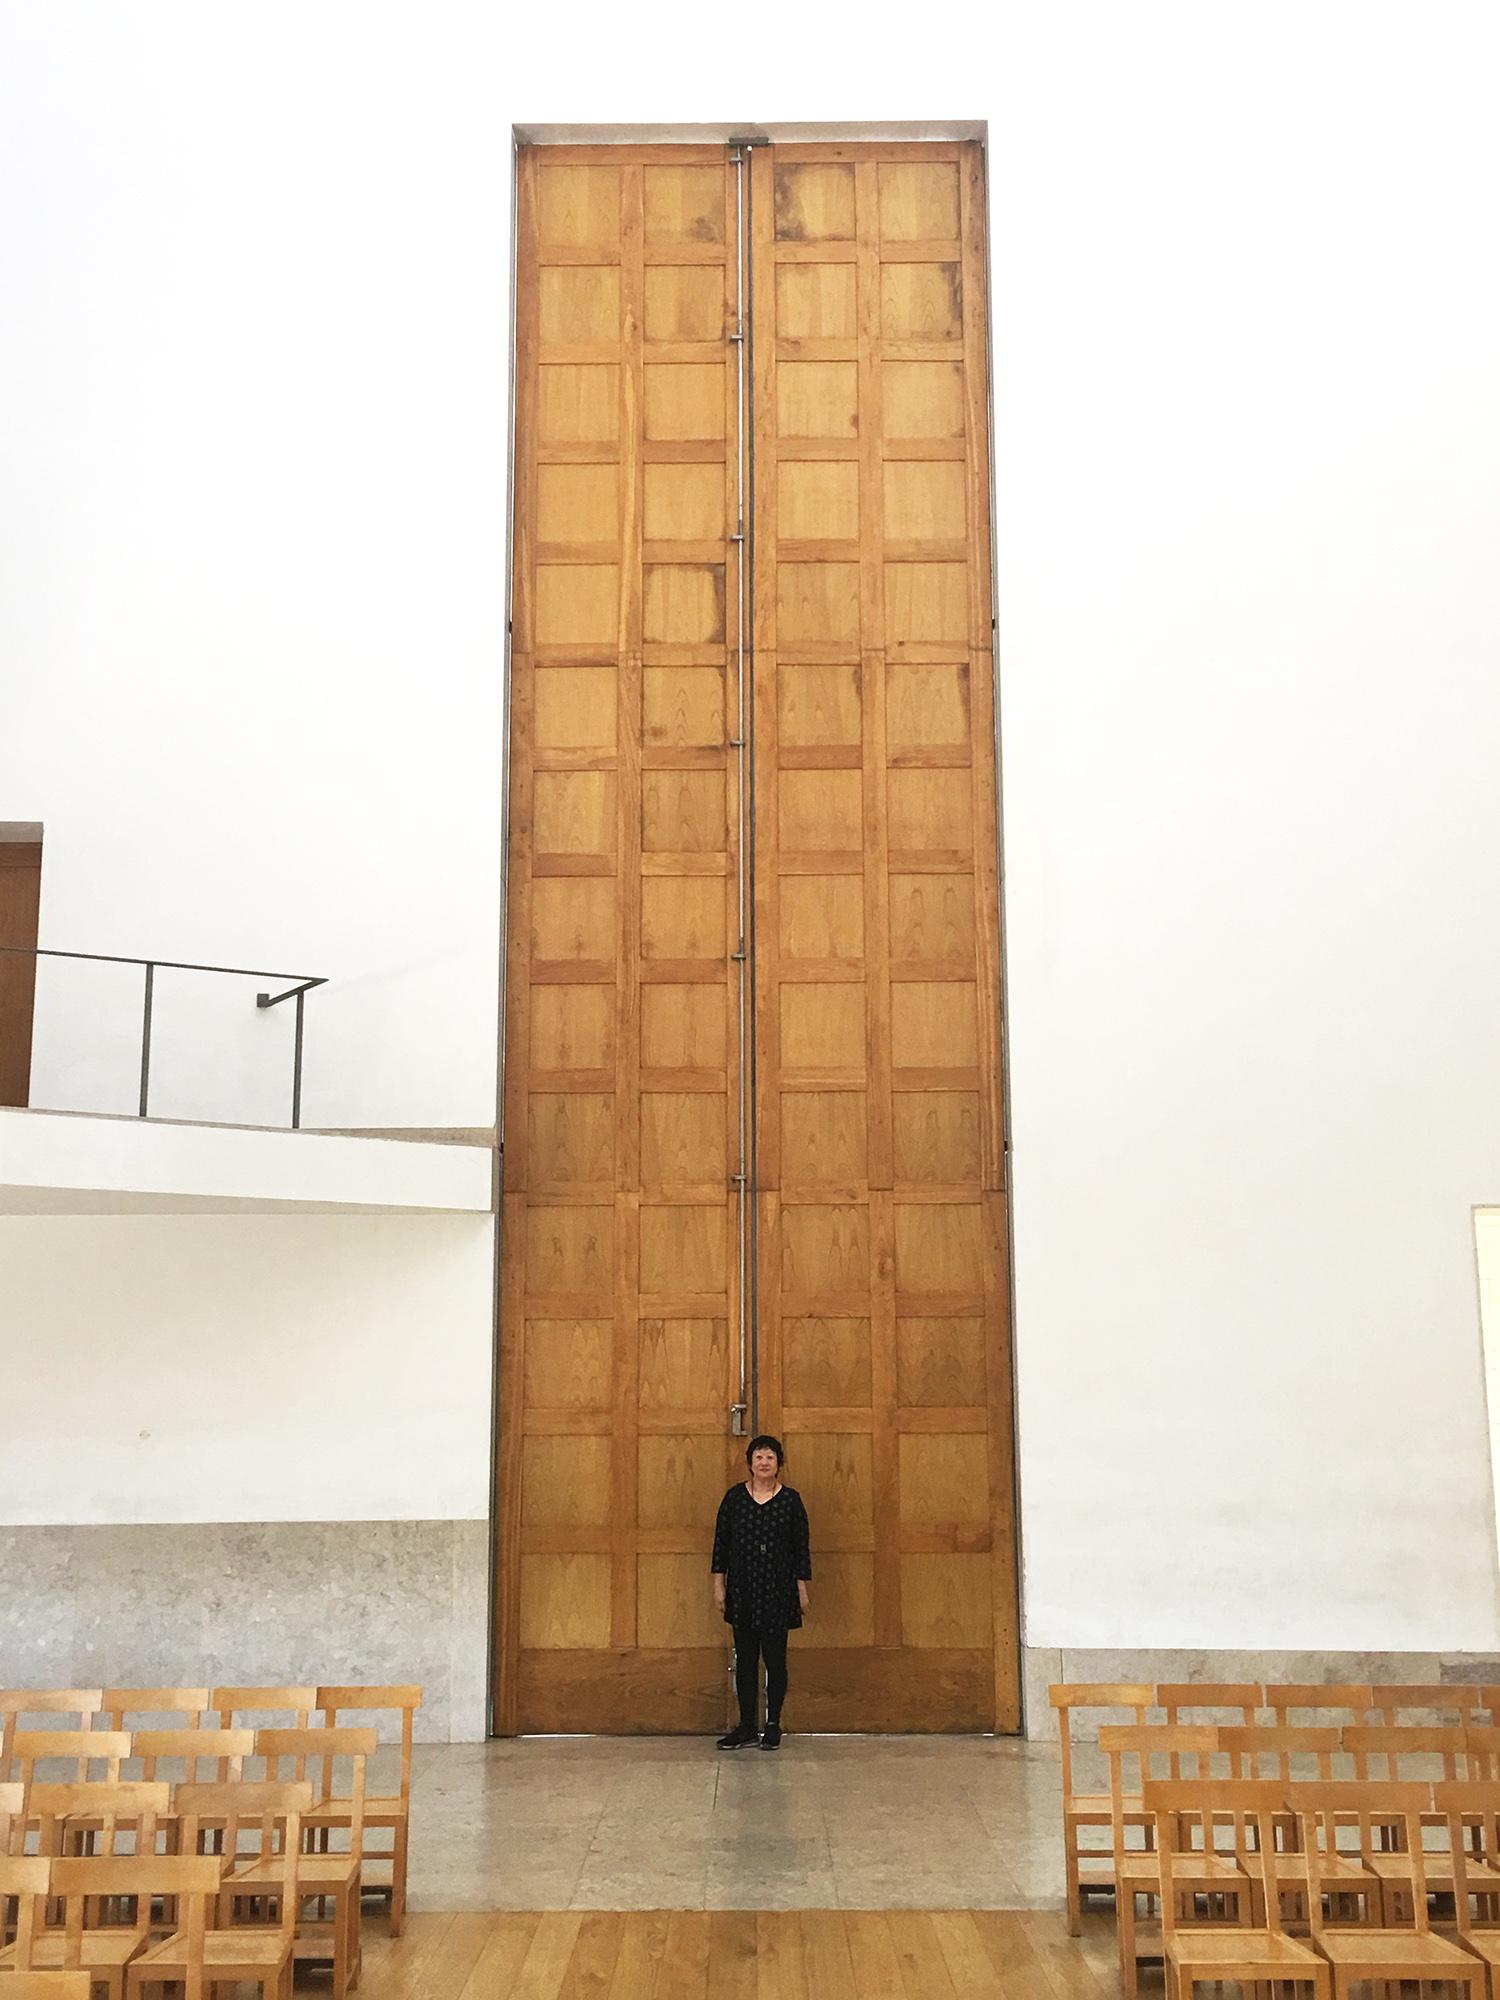 Entry Door at Santa Maria Church by Alvaro Siza